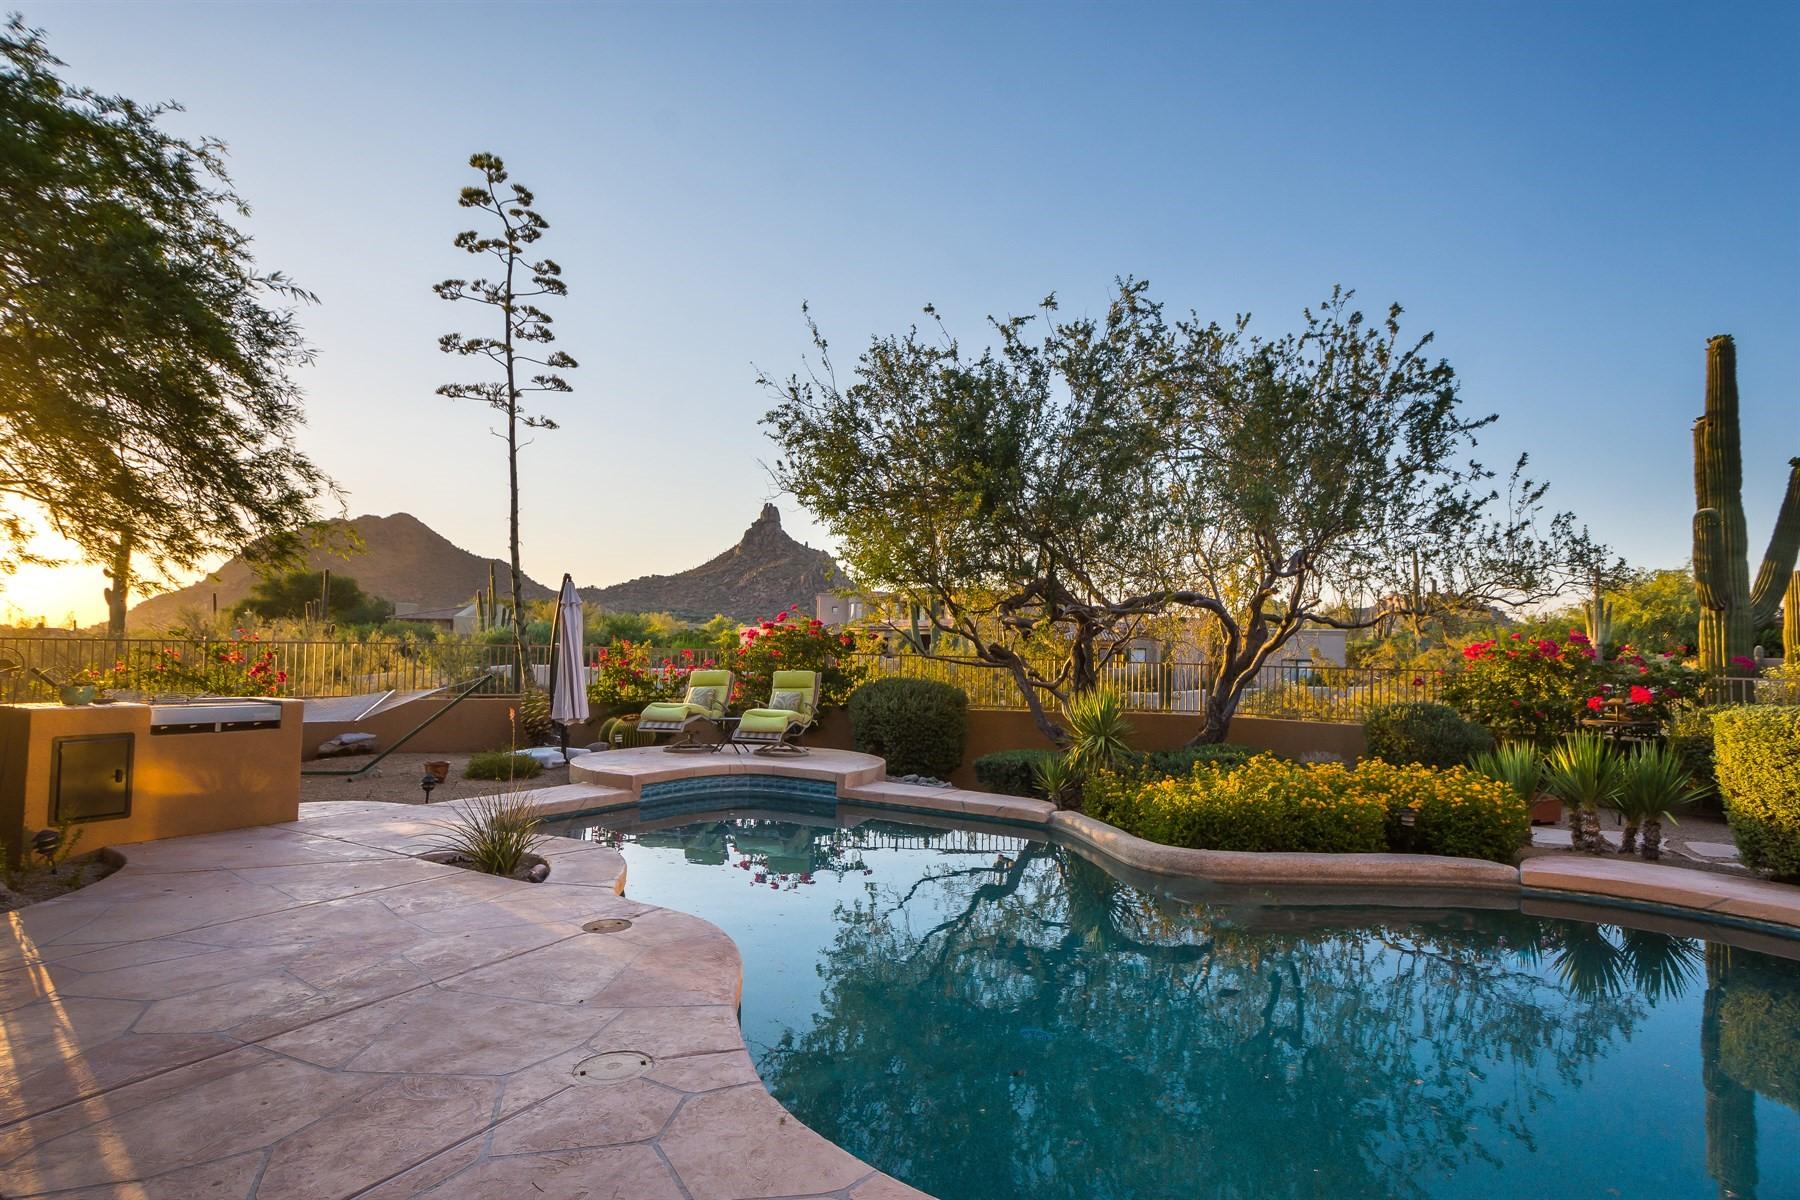 独户住宅 为 销售 在 Beautifully maintained home with spectacular views 10320 E Ranch Gate Rd, 斯科茨代尔, 亚利桑那州, 85255 美国